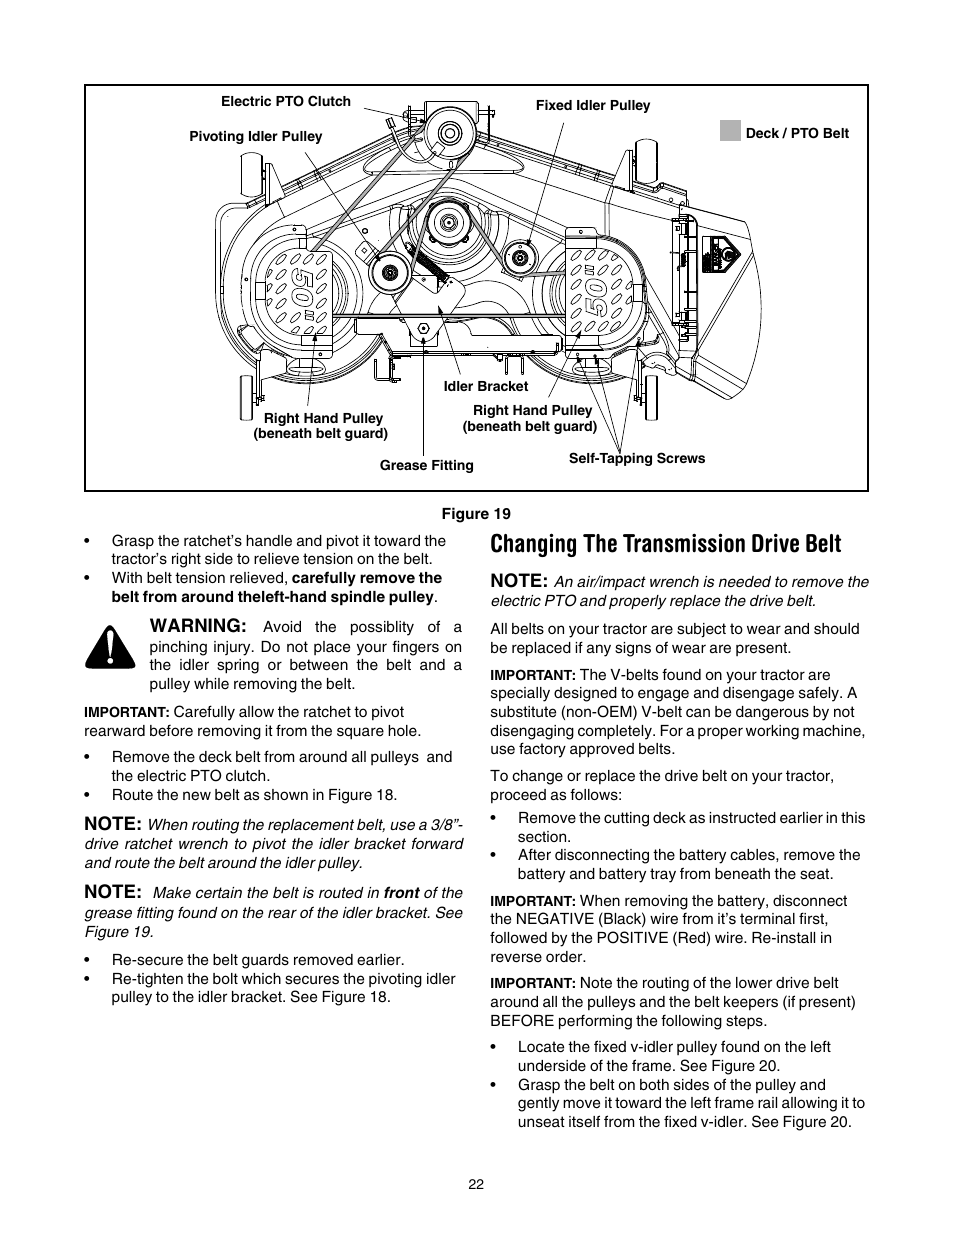 Cub Cadet Pto Clutch Wiring Diagram | Wiring Library